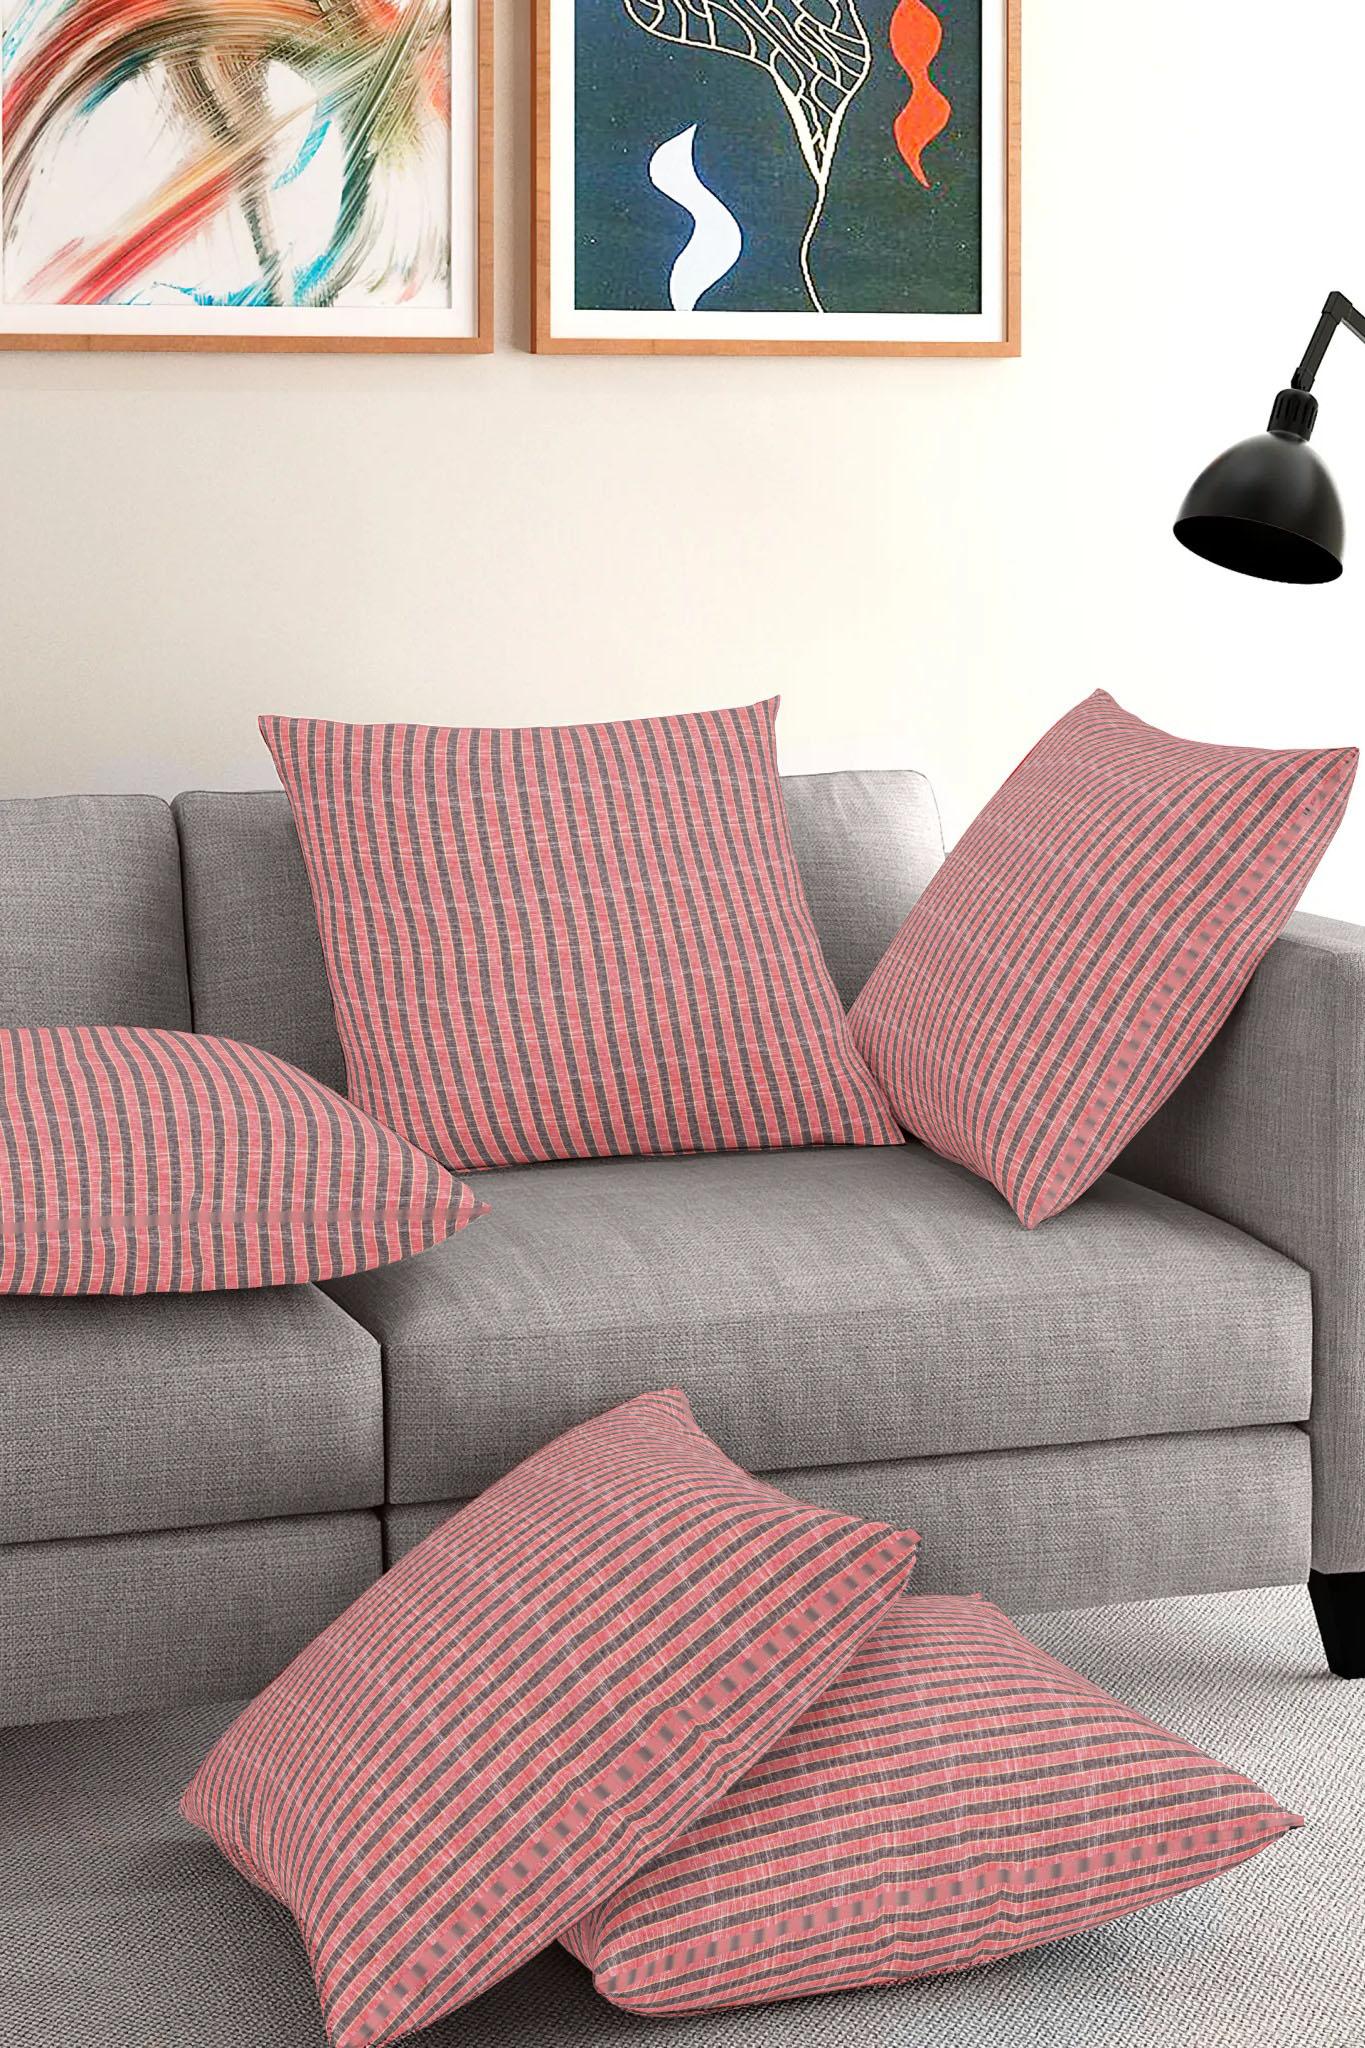 /home/customer/www/fabartcraft.com/public_html/uploadshttps://www.shopolics.com/uploads/images/medium/Pink-Gray-Cotton-Cushion-Cover-35394.jpg